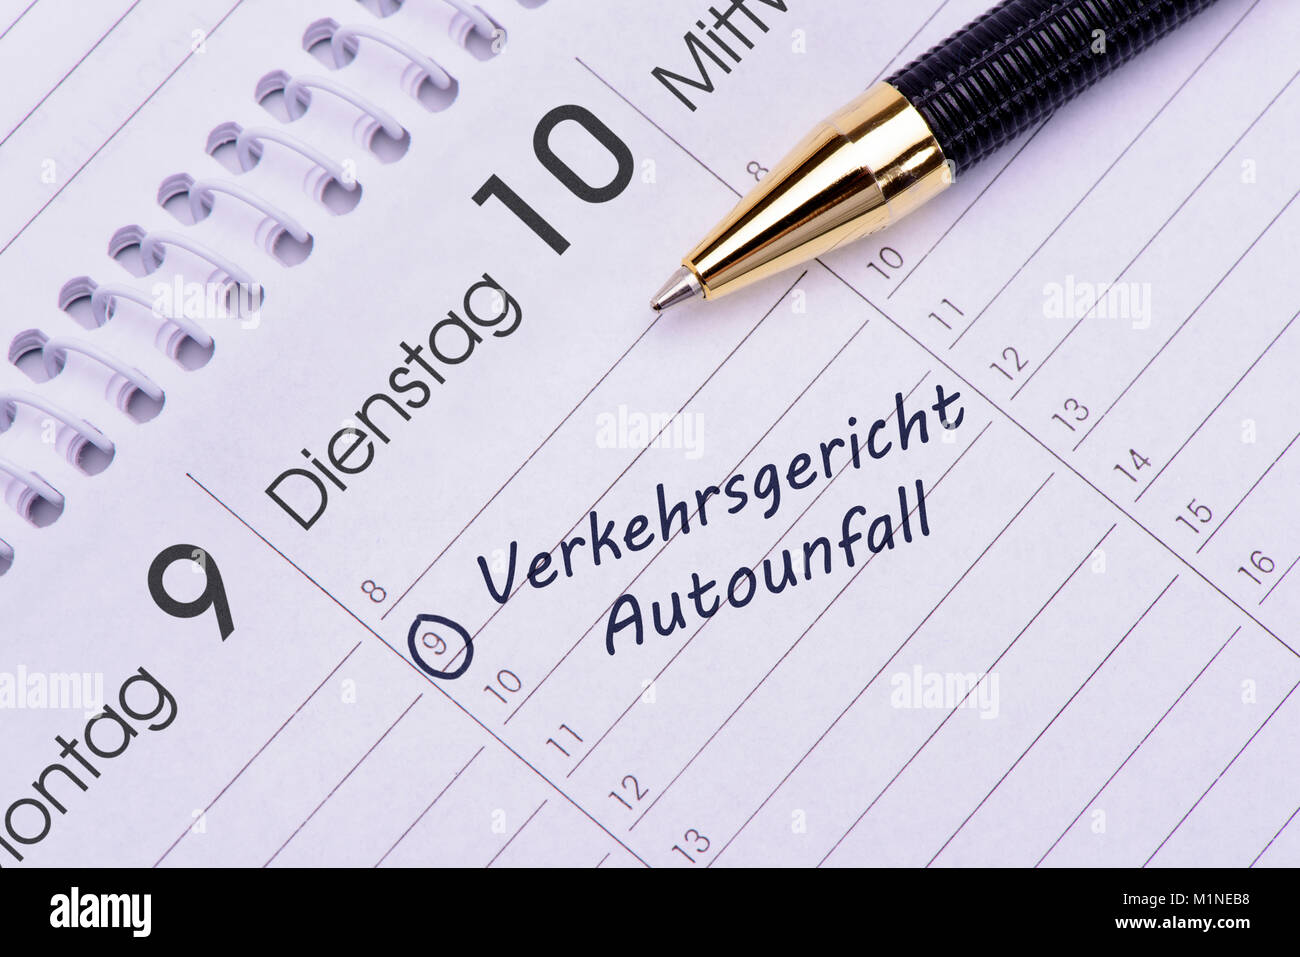 Verkehrsgericht für Autounfall Termin im Kalender Stockfoto